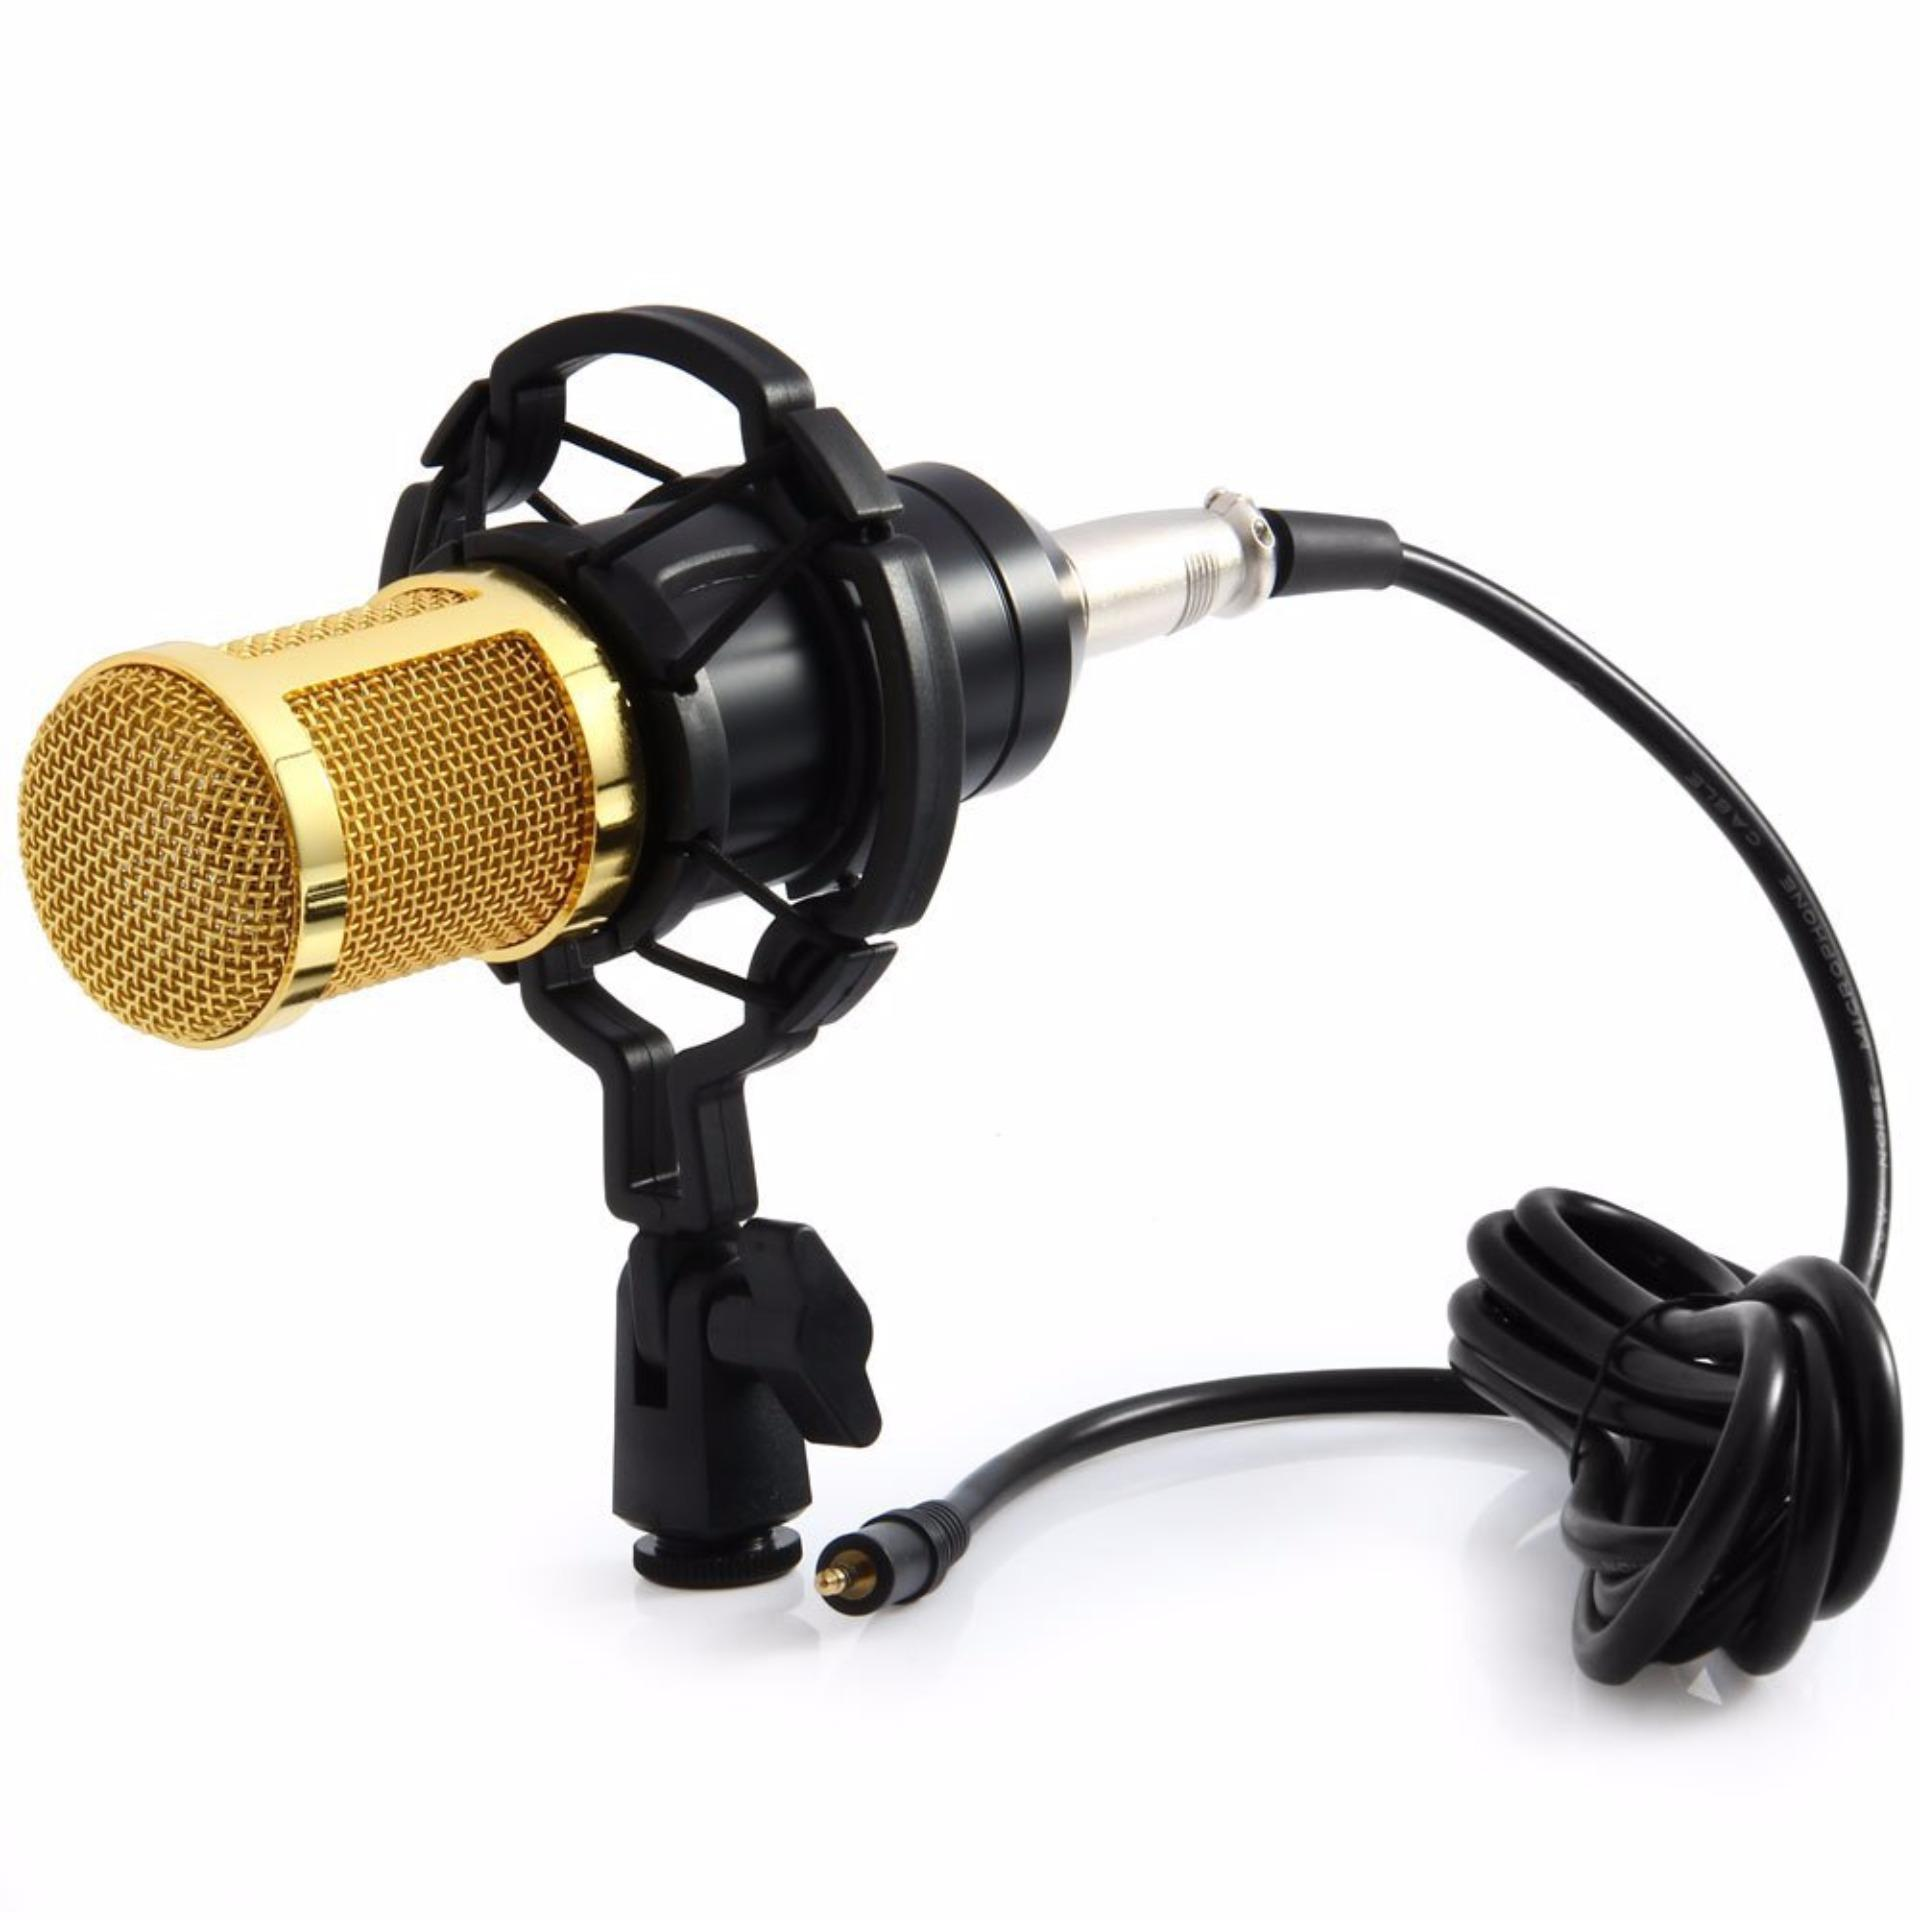 Spesifikasi Taffware Mikrofon Kondenser Studio Dengan Shock Proof Mount Bm800 Black Marlow Jean